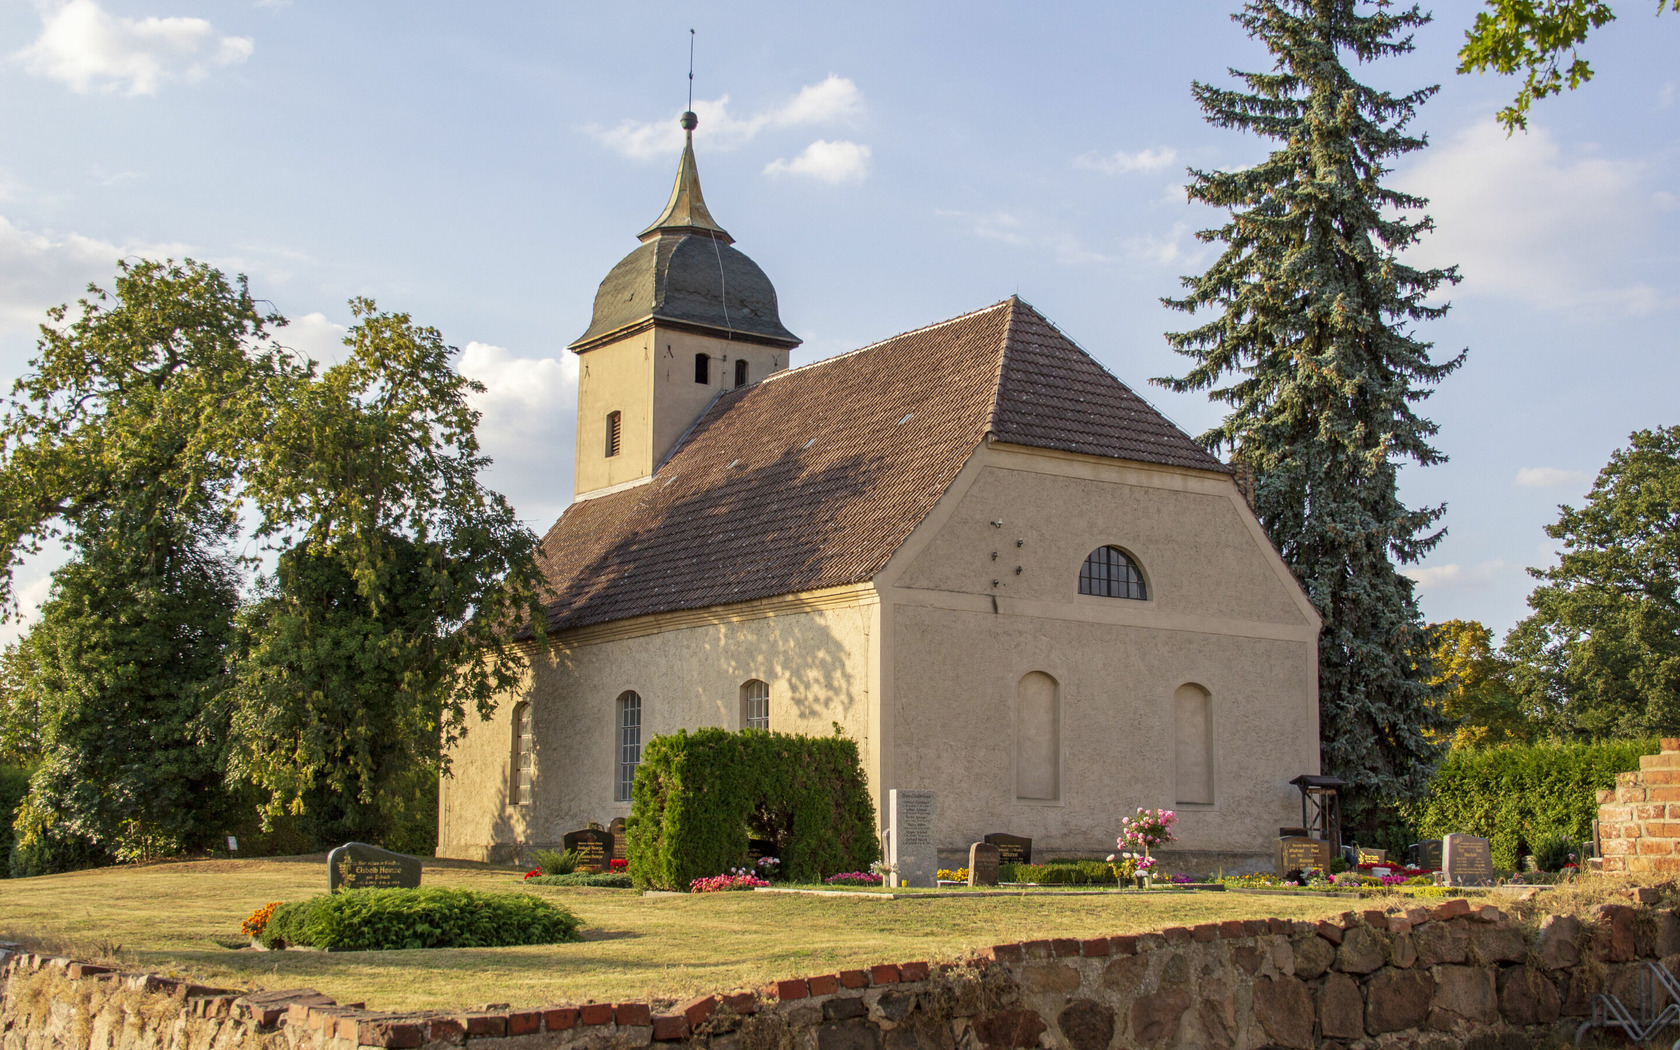 Kirche Sembten, Foto: TMB-Fotoarchiv/ScottyScout, Lizenz: TMB-Fotoarchiv/ScottyScout